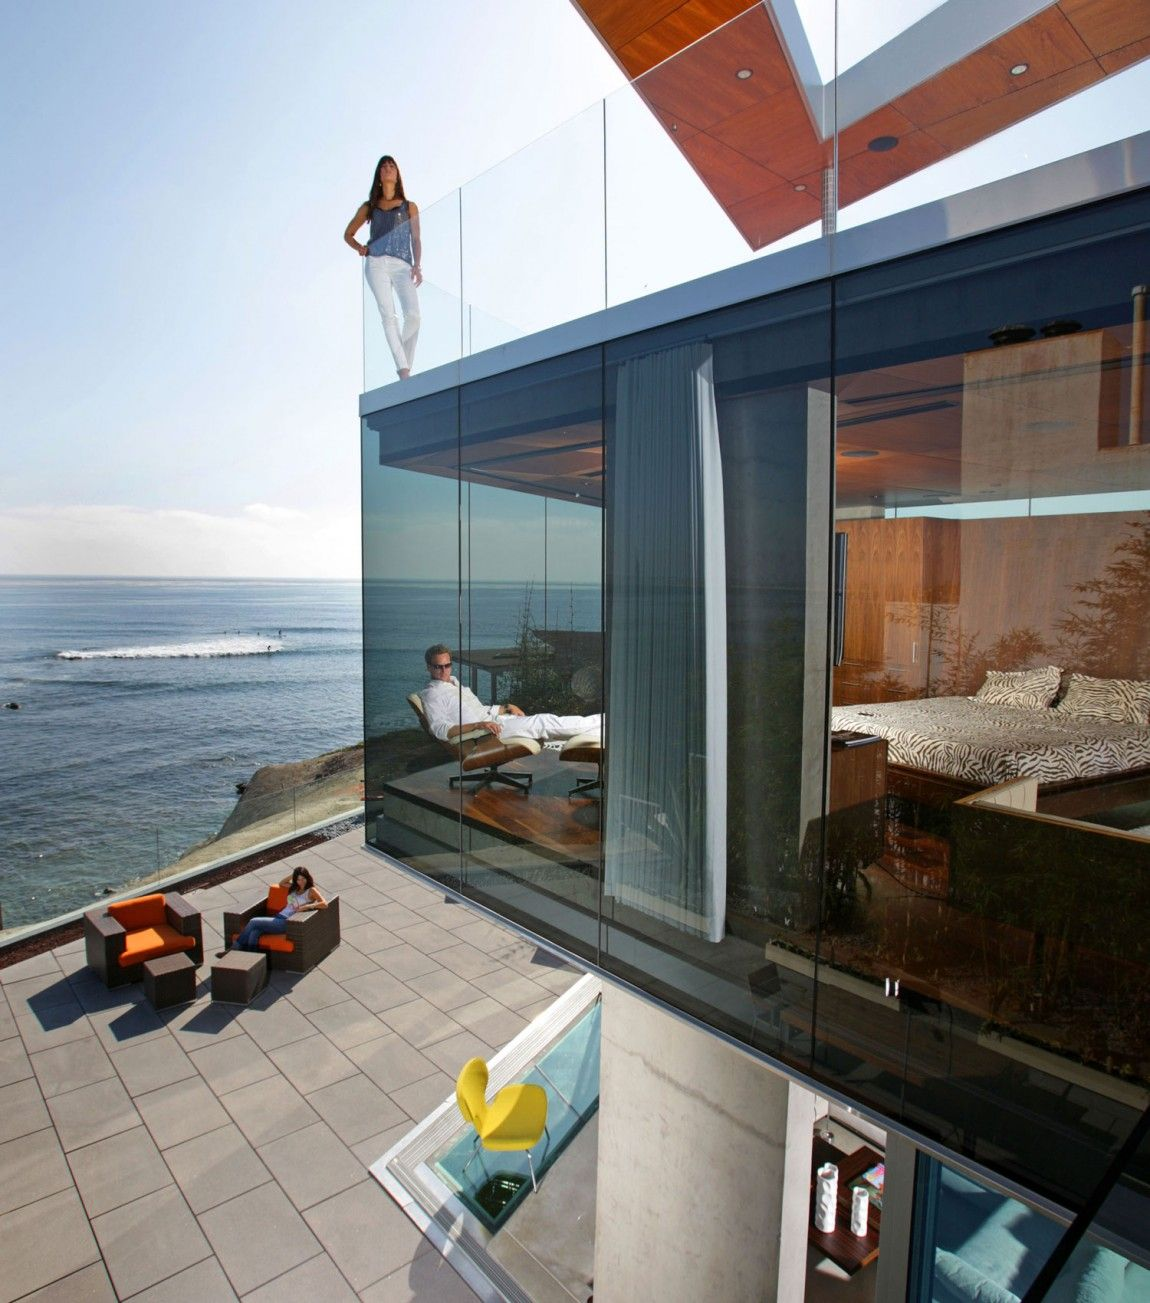 The Lemperle Residence by Jonathan Segal 5